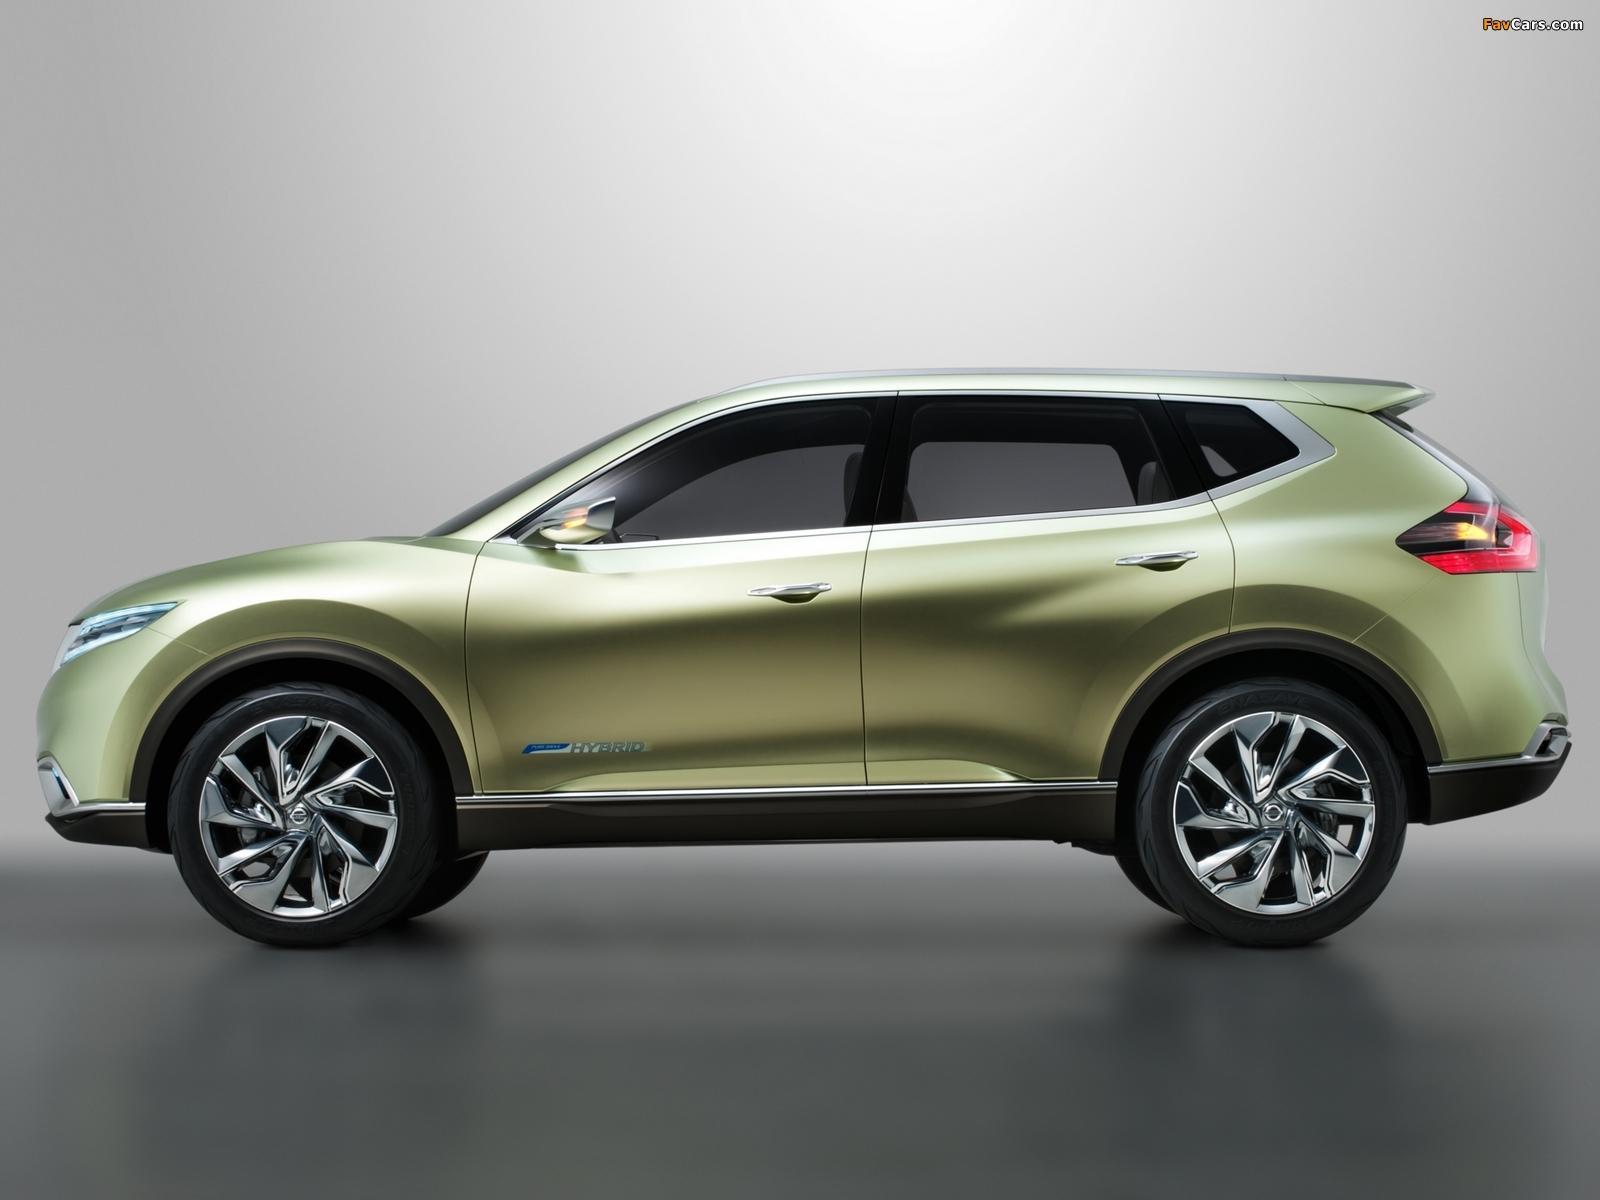 Nissan Hi-Cross Concept 2012 photos (1600 x 1200)